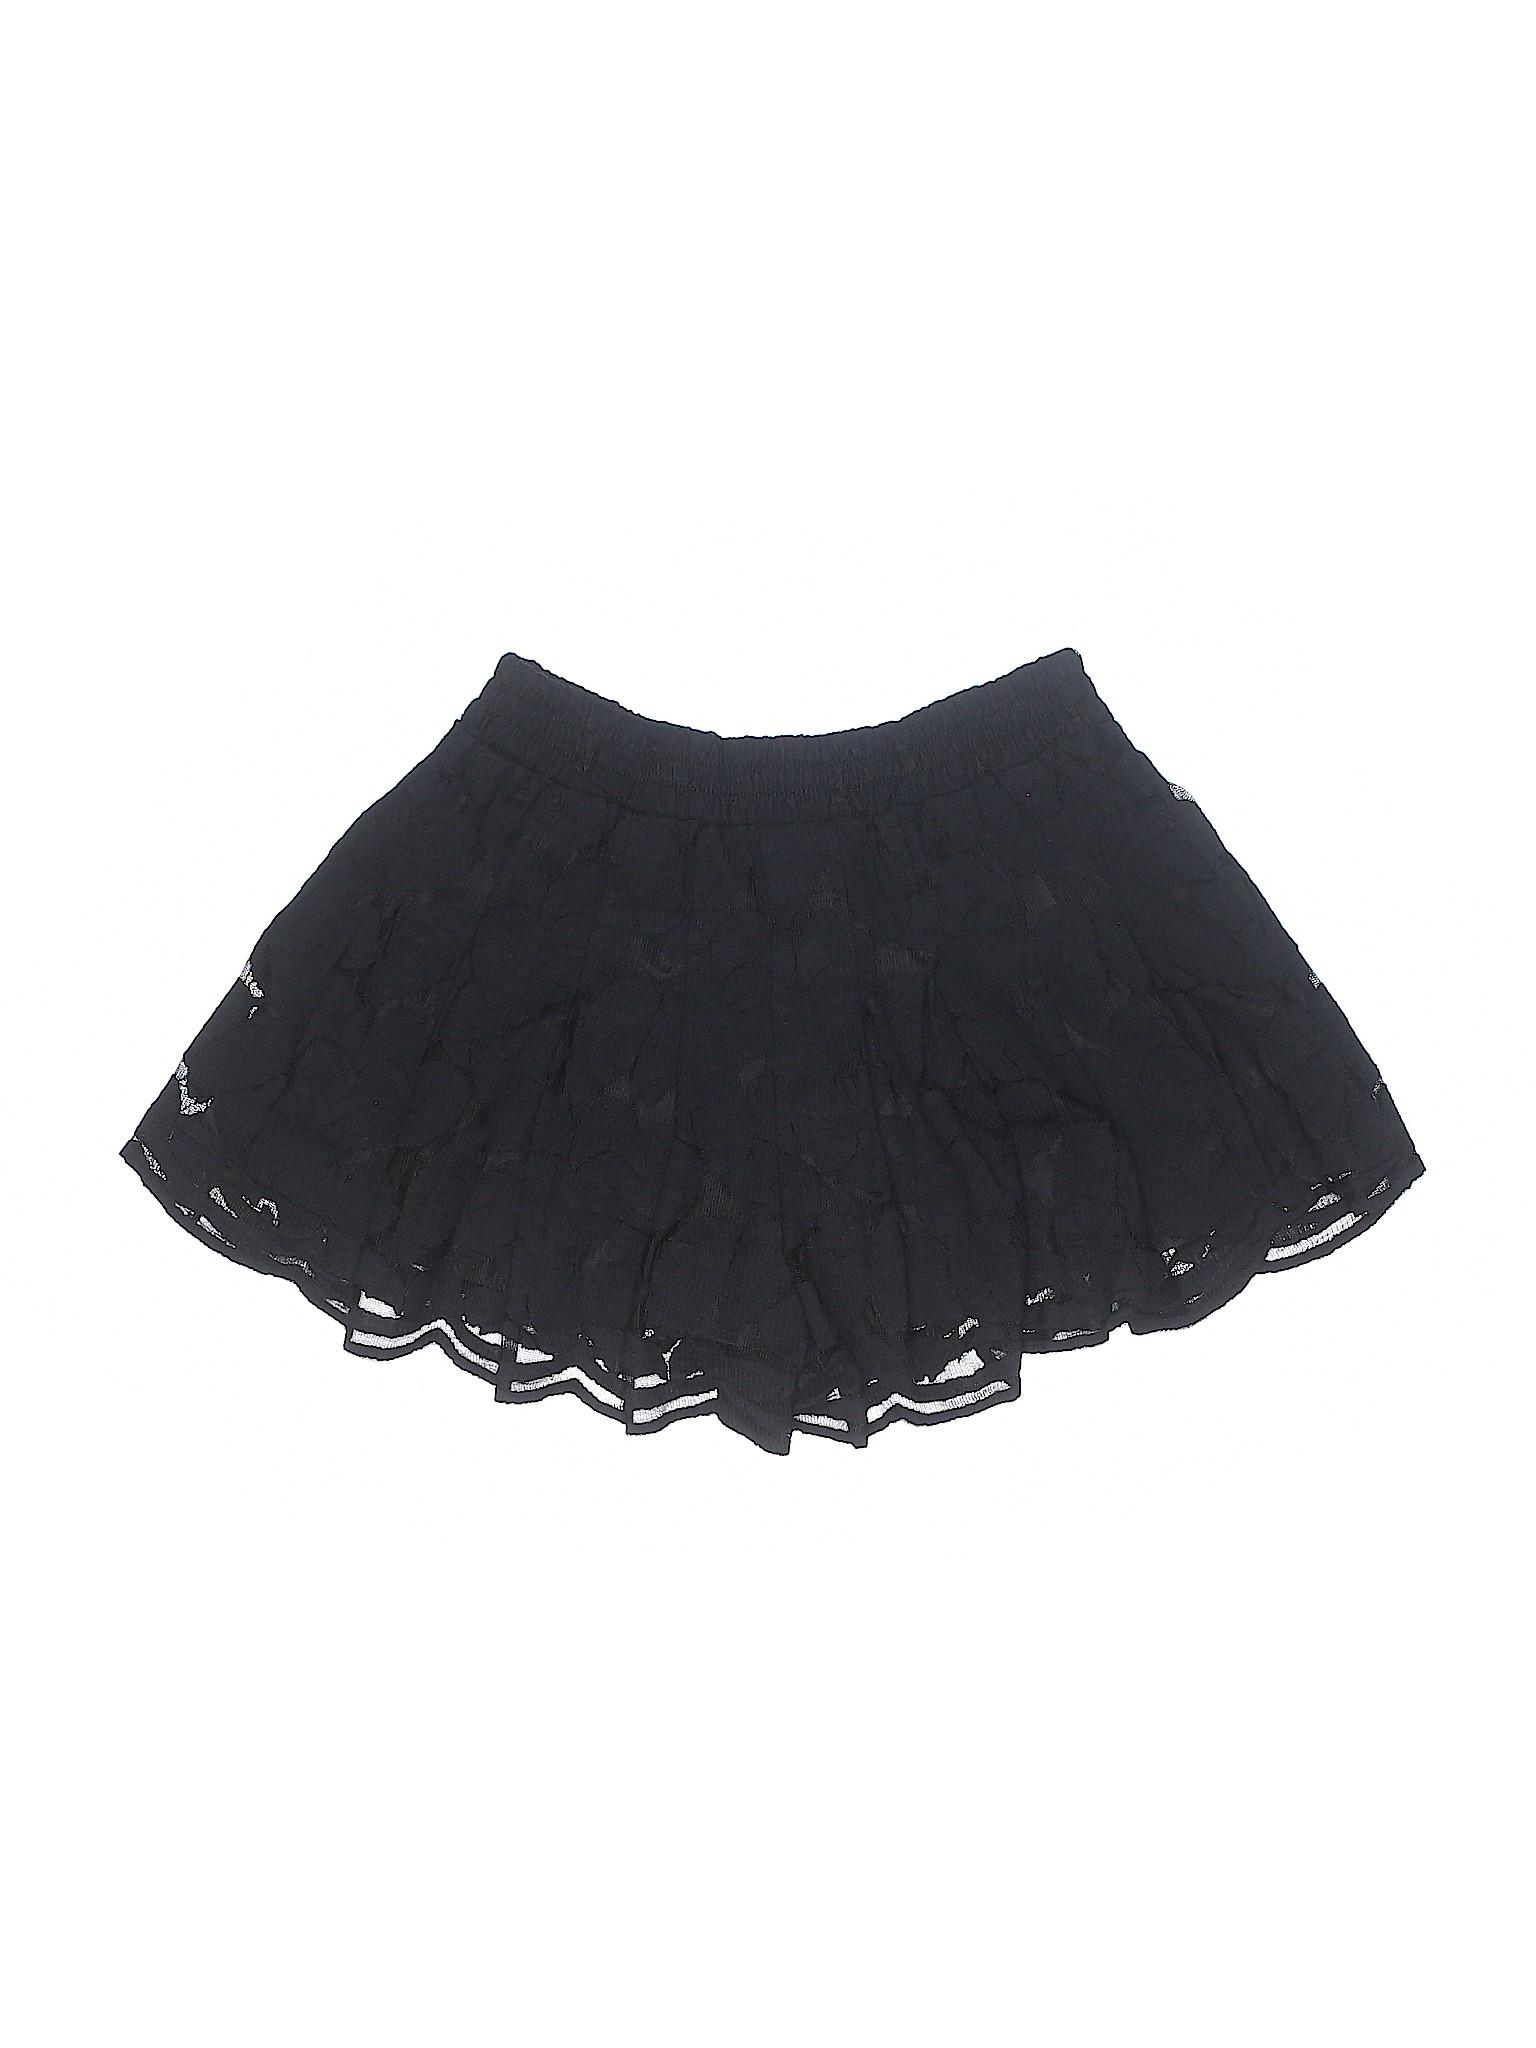 J PJK Kincaid Boutique Patterson Shorts q8U7B